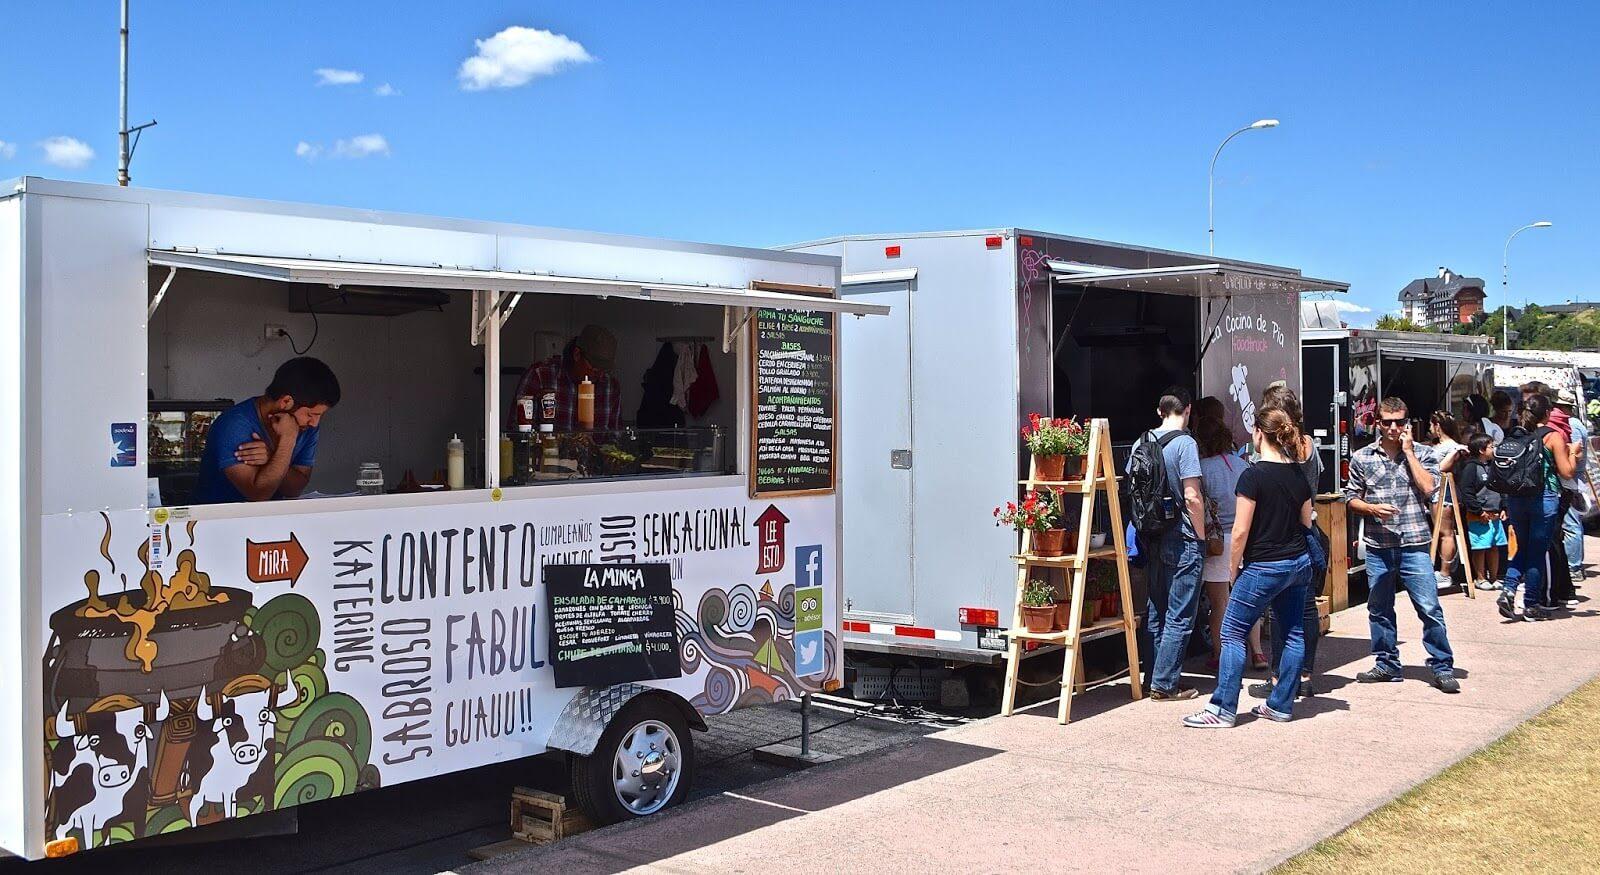 Os estilosos Foodtrucks da Patagônia - Crédito da foto: Southern Cone Travel